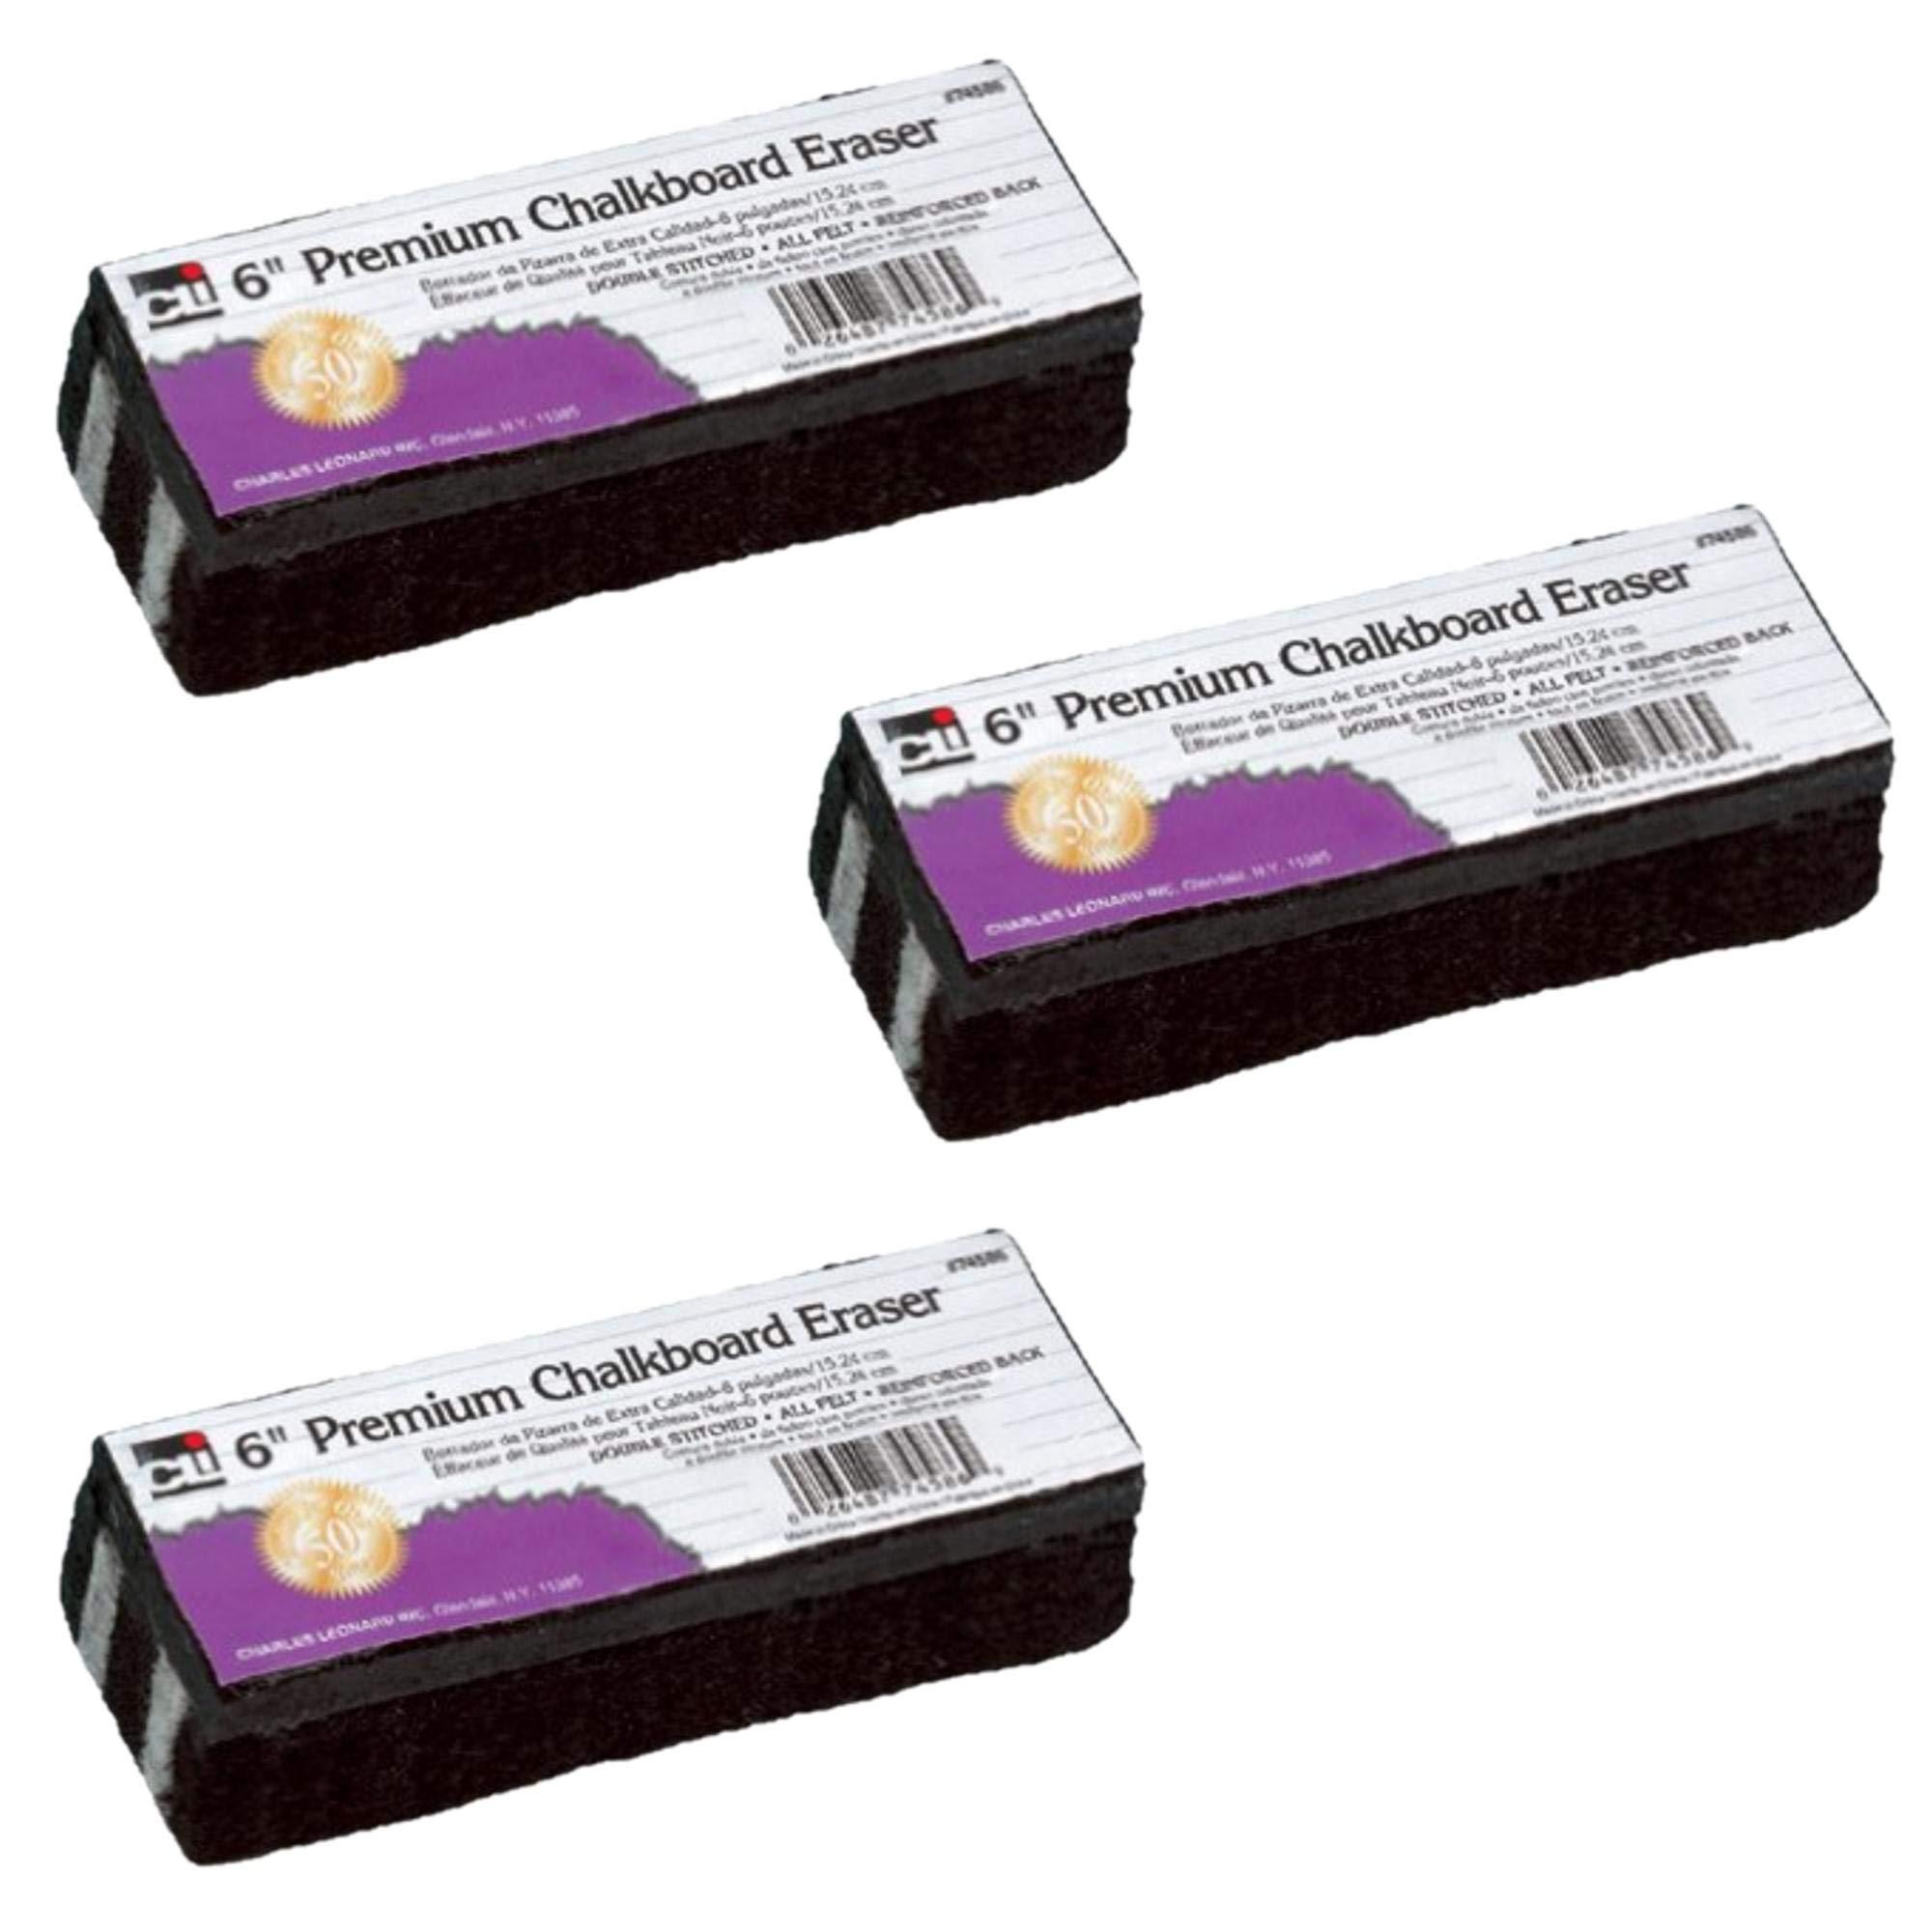 Charles Leonard Chl74586 Premium Chalkboard Eraser (3 Pack) by Charles Leonard (Image #1)